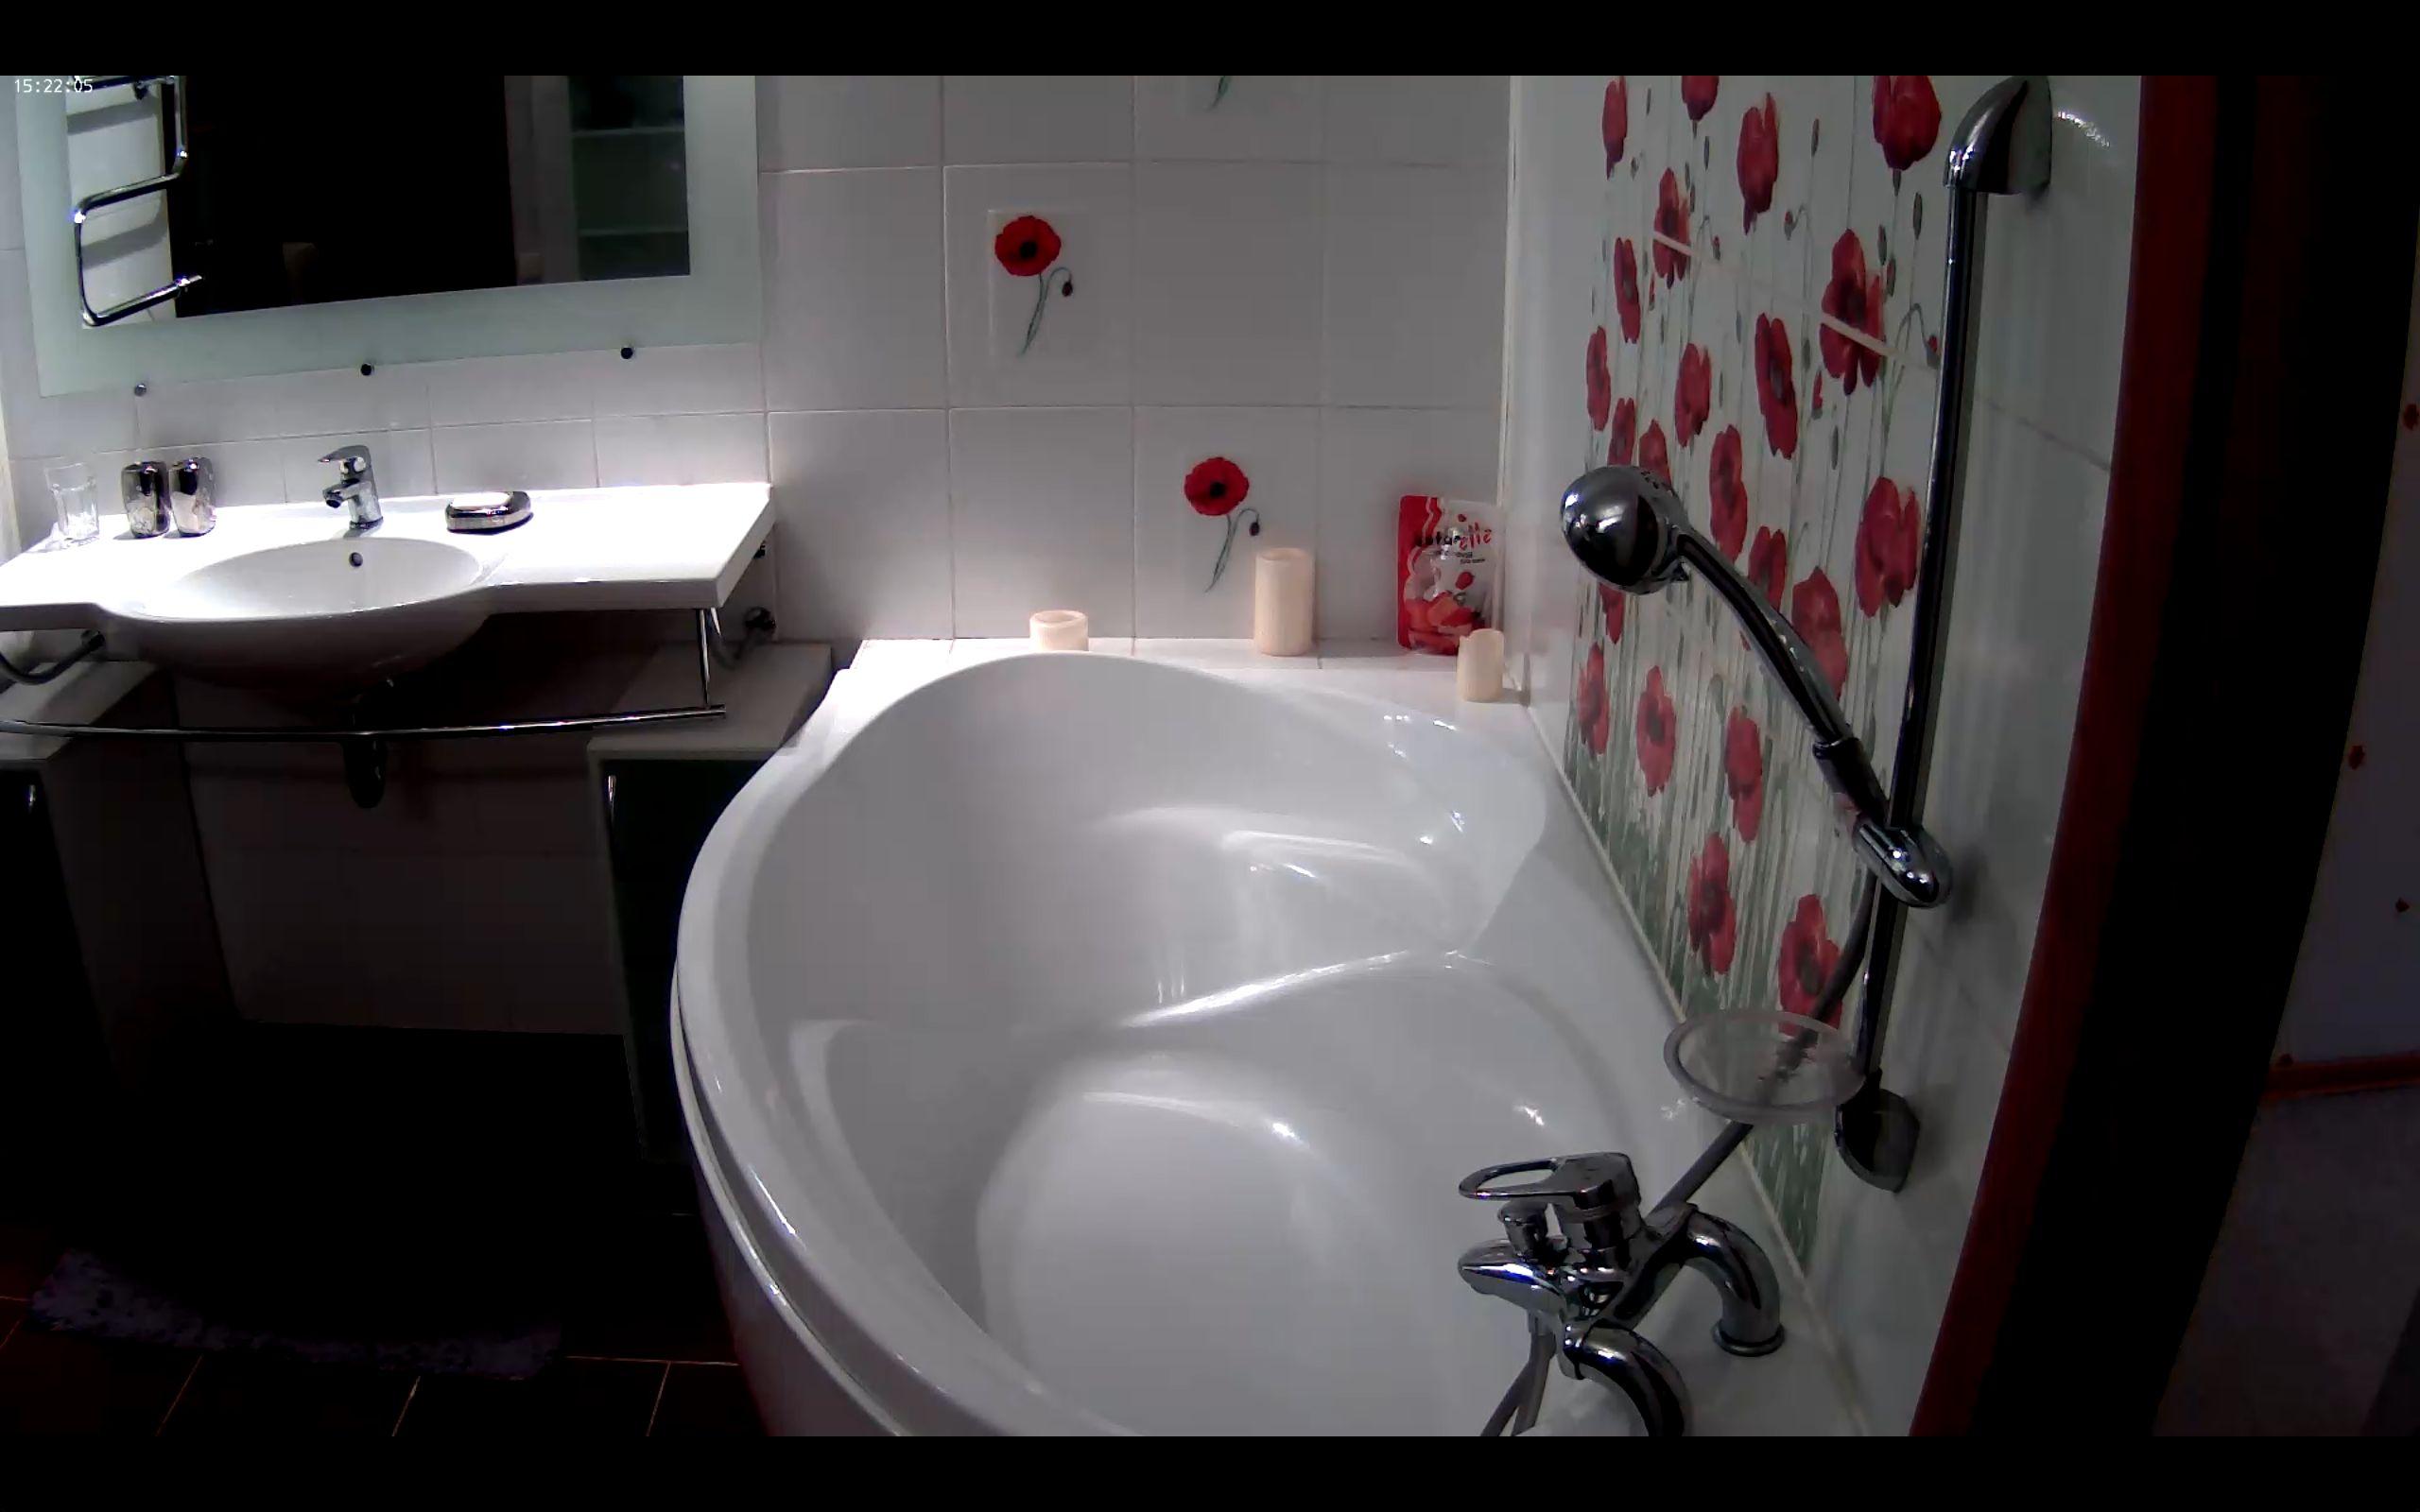 First Latvian Fusker reallifecam com images 20150126 cam09 1 10  Real Life  Cam Bathroom. Splashbacks For Bathroom Walls